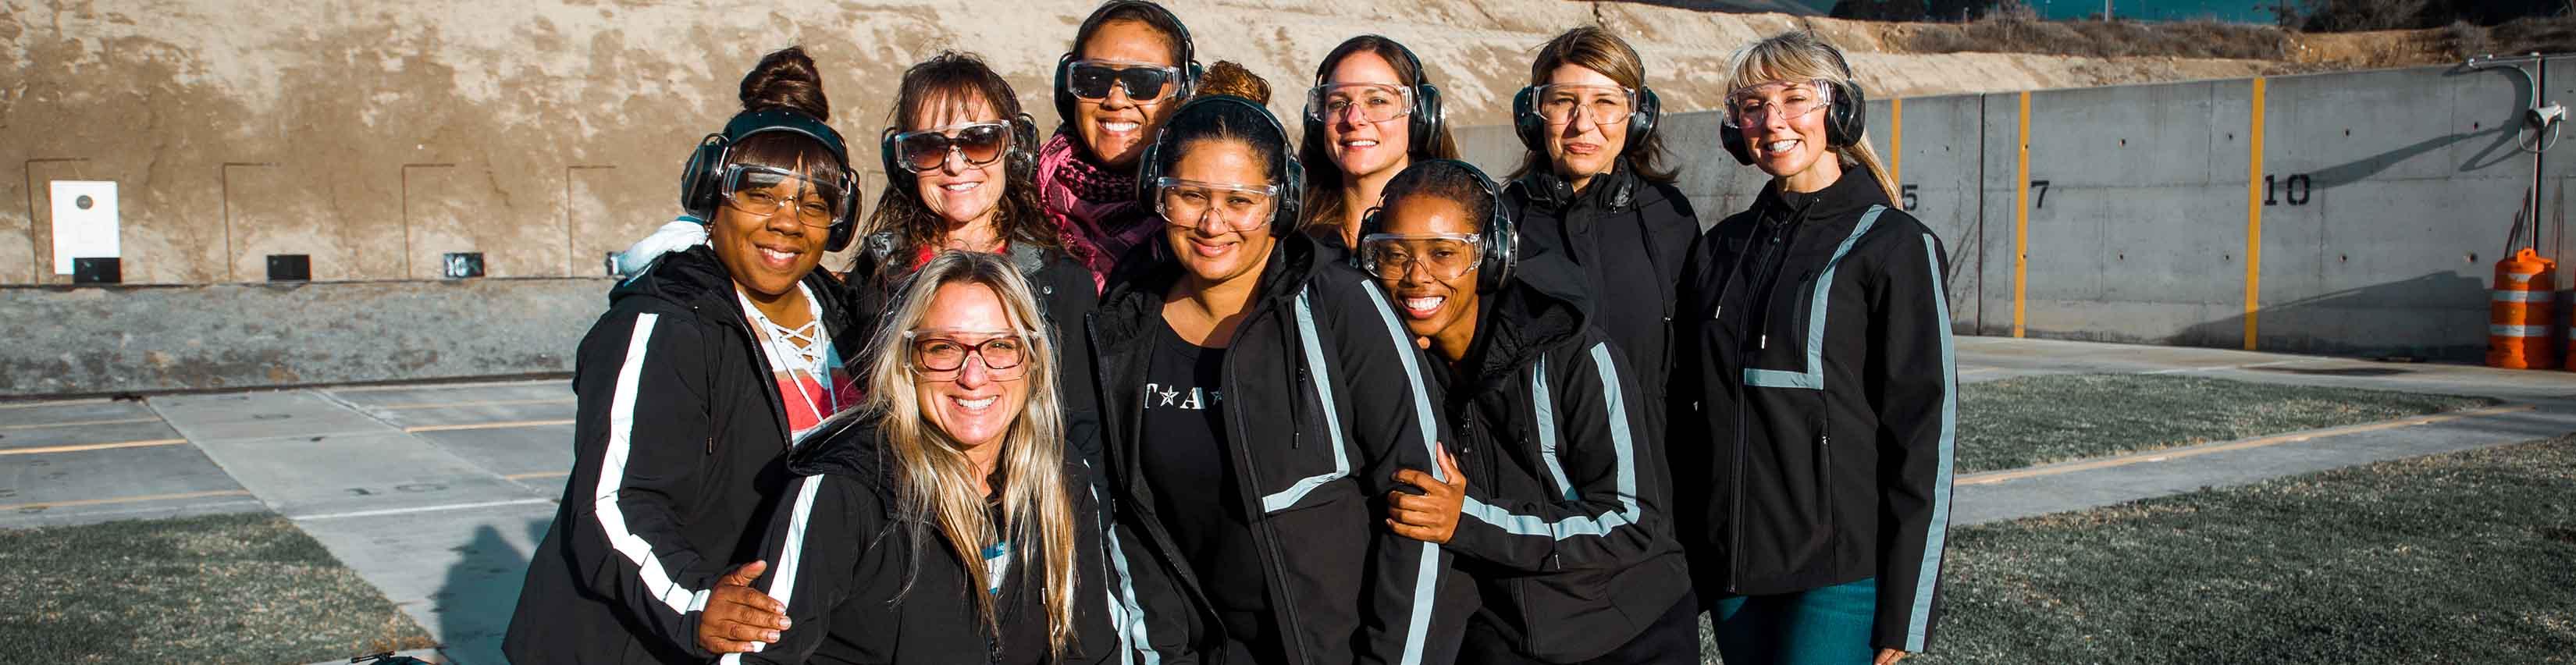 active valor women